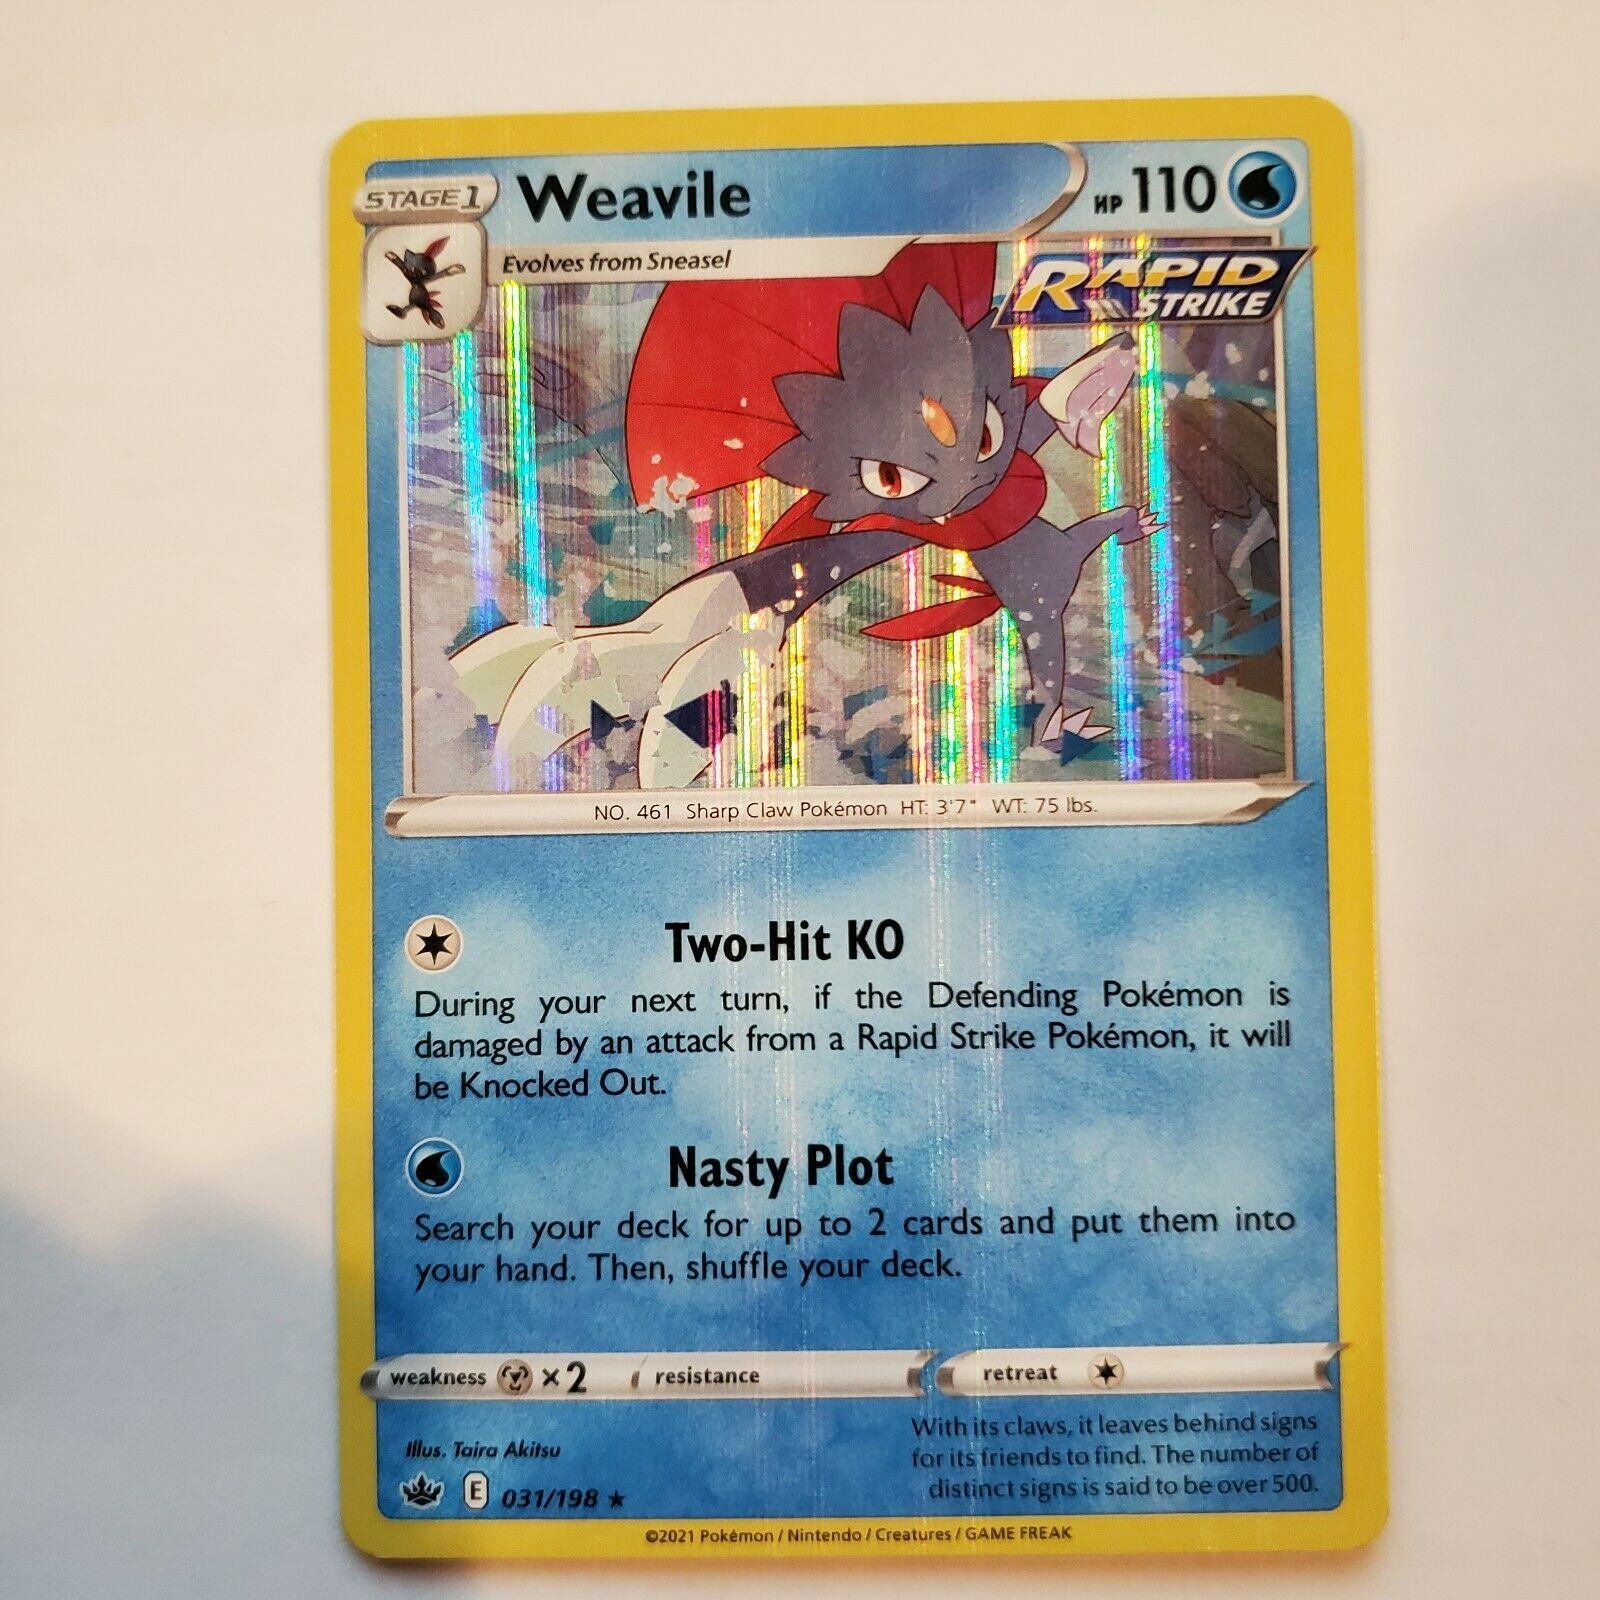 Pokemon TCG Weavile 031/198 Holo Chilling Reign